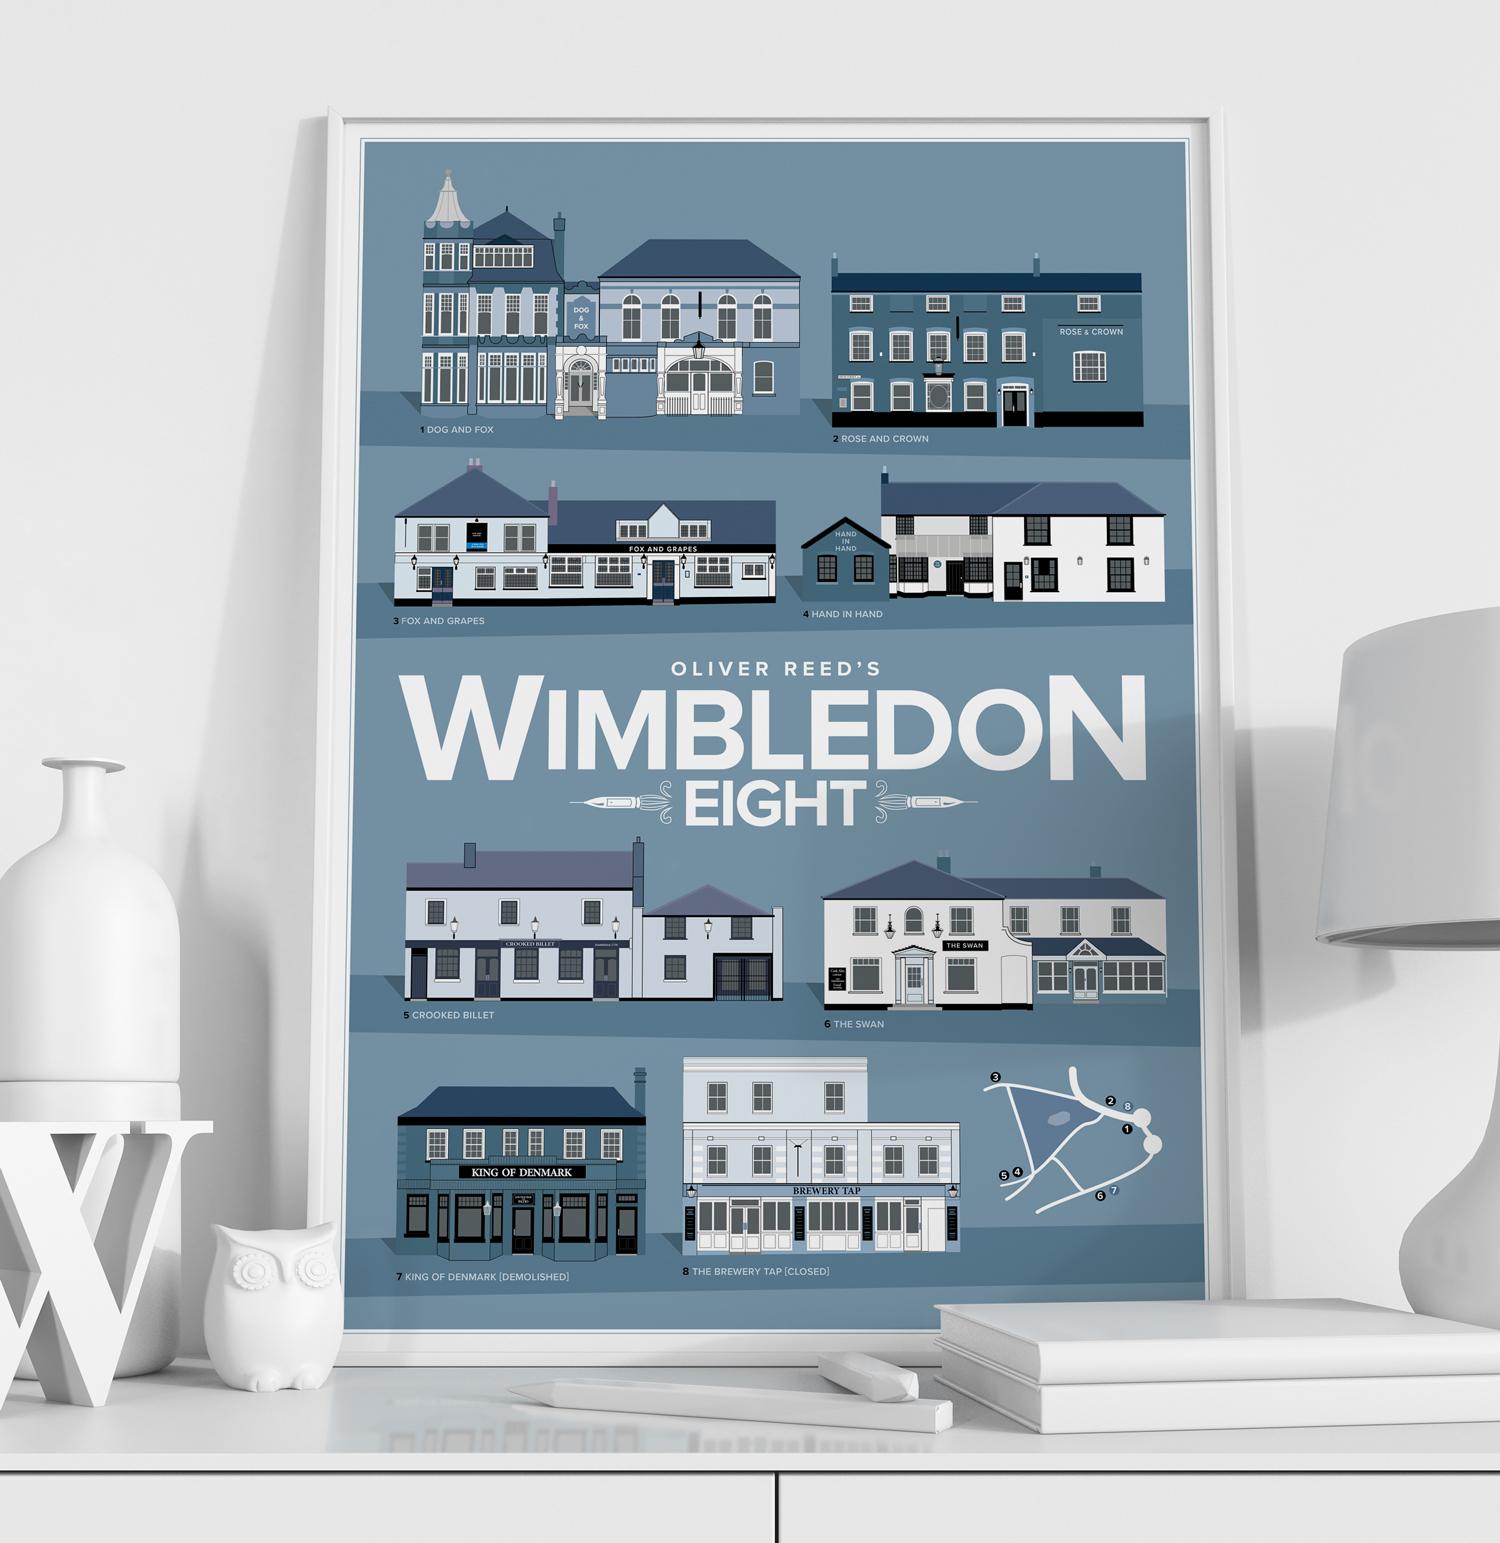 Oliver Reed's Wimbledon 8 Pub Crawl Print White Frame